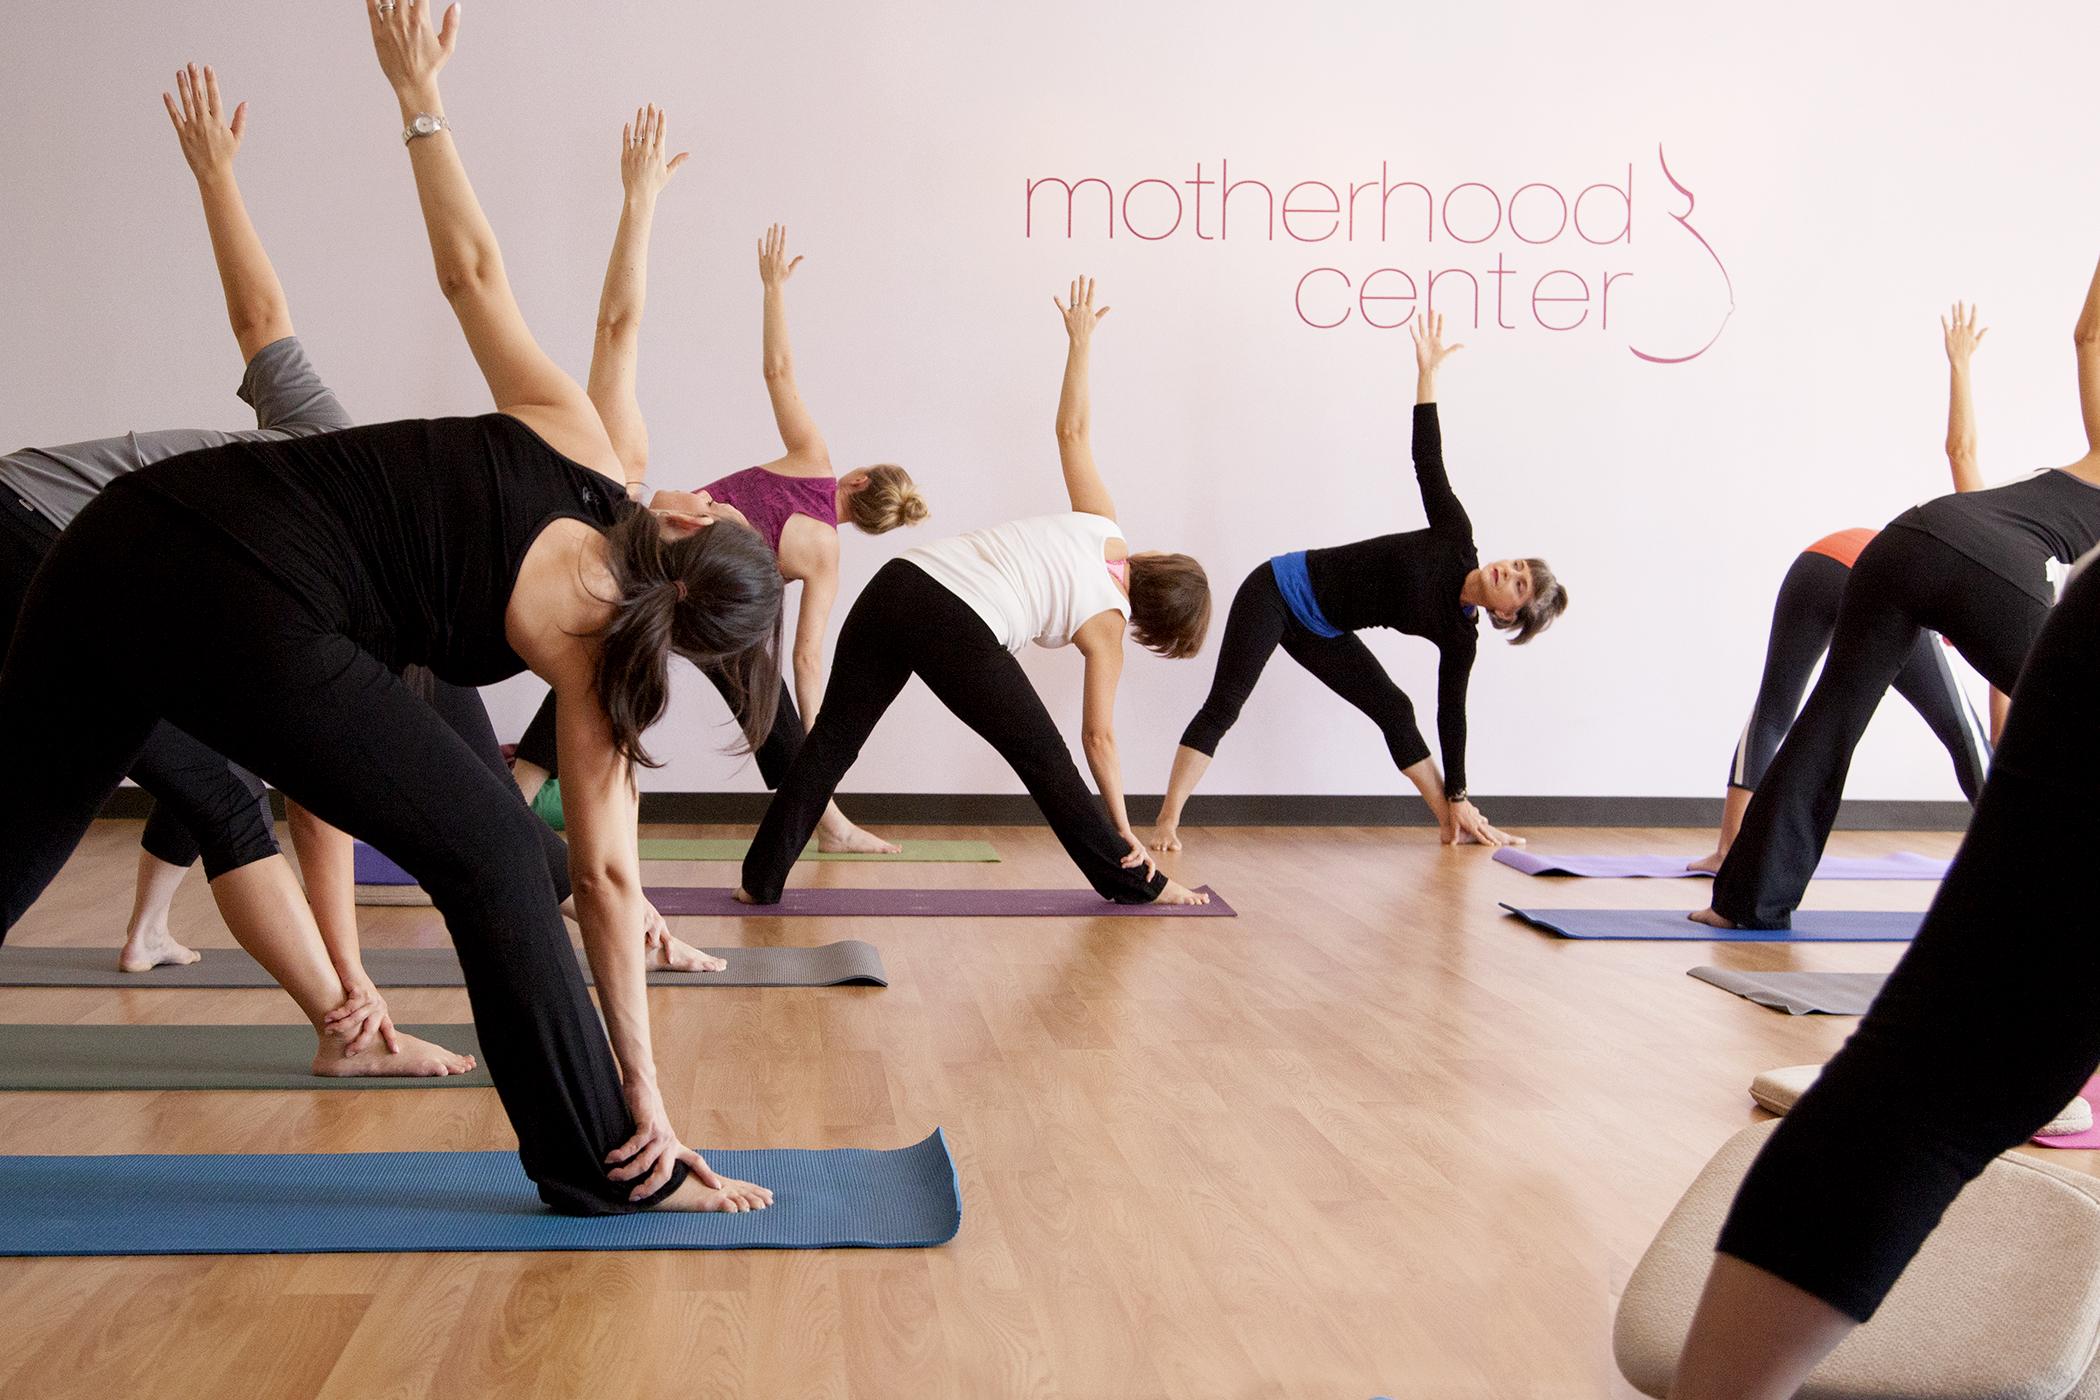 Motherhood Center Baby Doula Houston Houston Doula